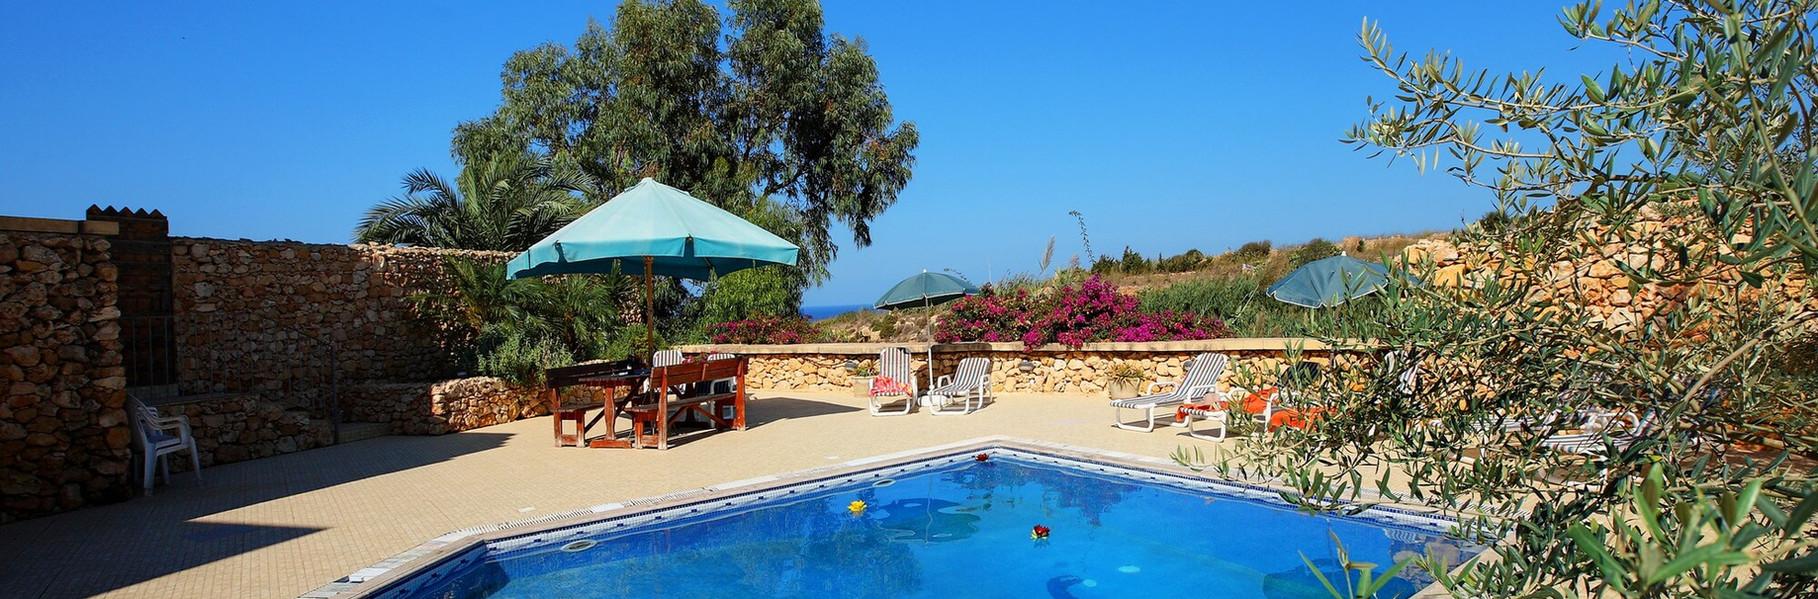 pool-and-view-villa-3-gozo.jpg